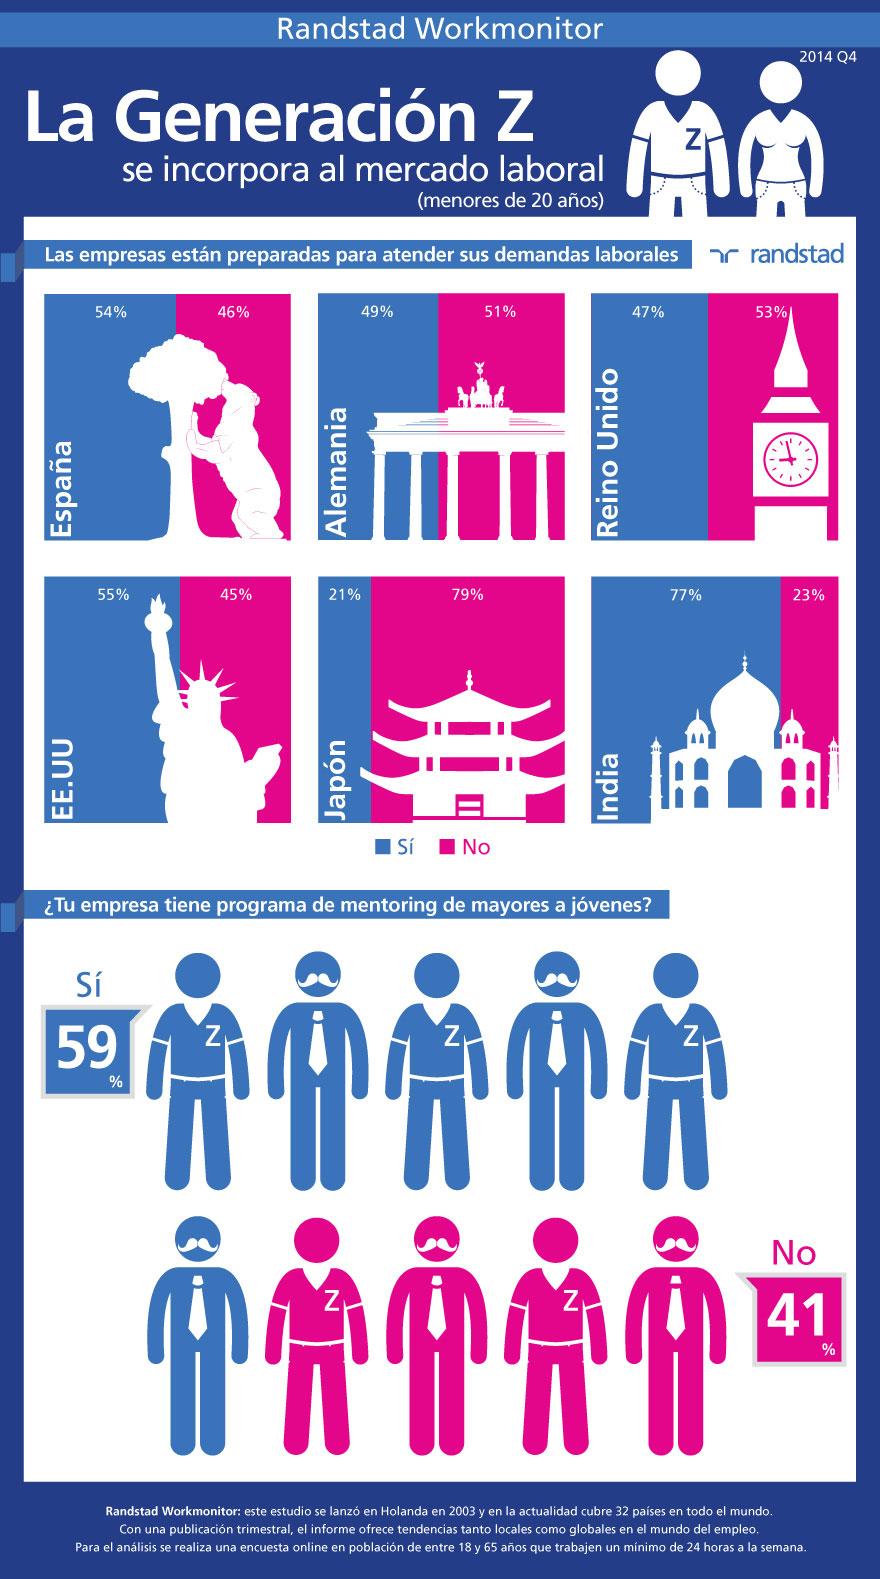 infografia-generacion-z-mercado-laboral-workmonitor-q4-2014.jpg